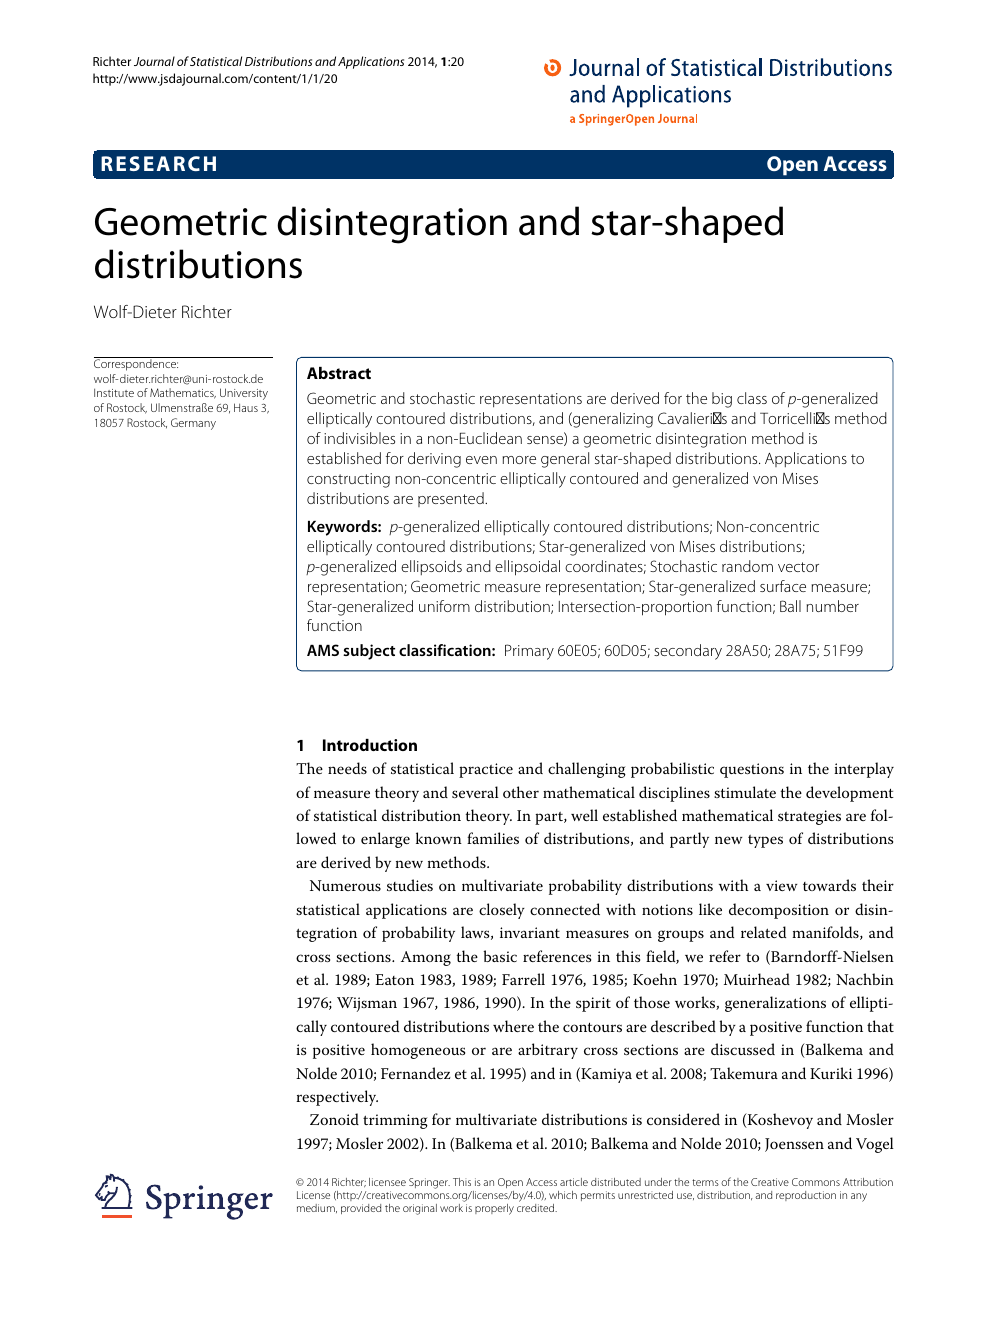 Geometric disintegration and star-shaped distributions